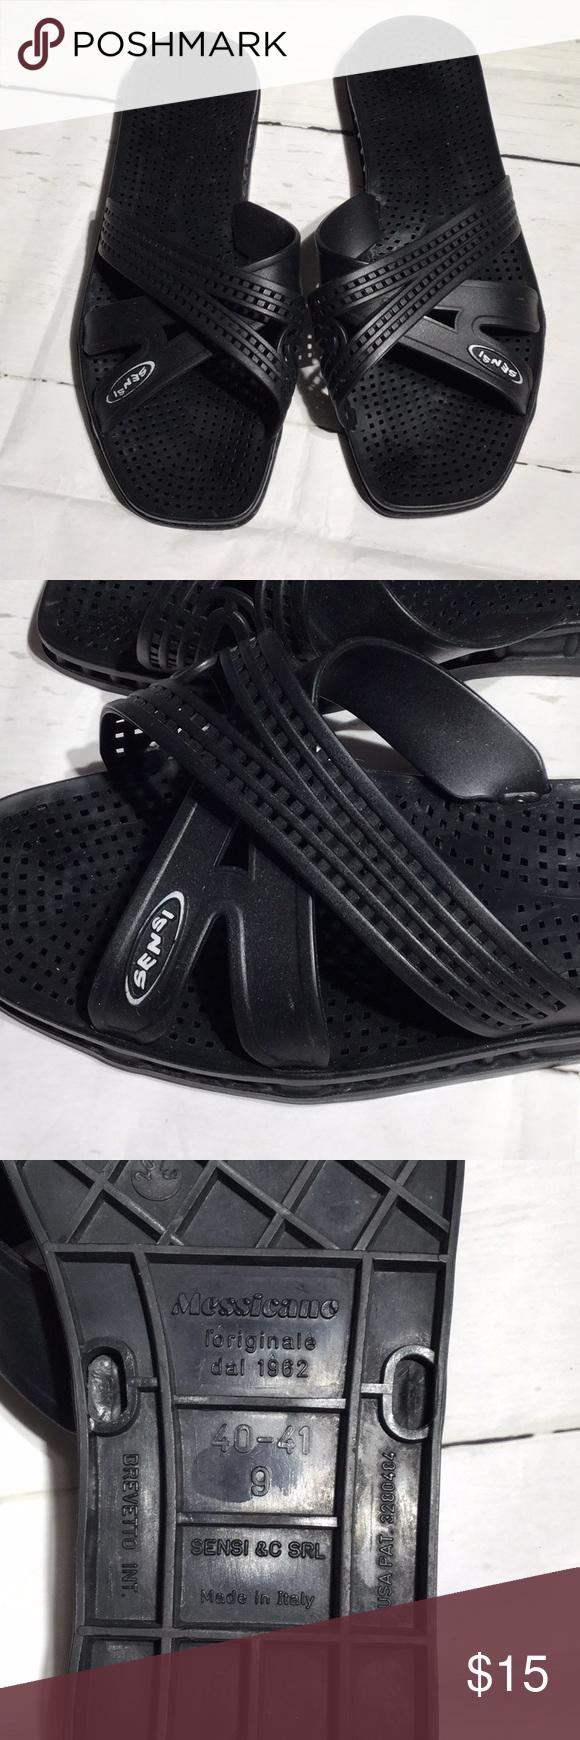 0556facf719da1 Sensi Mexico Spa Sandal Black gently loved   Spa Sandal   Sensi Shoes  Sandals